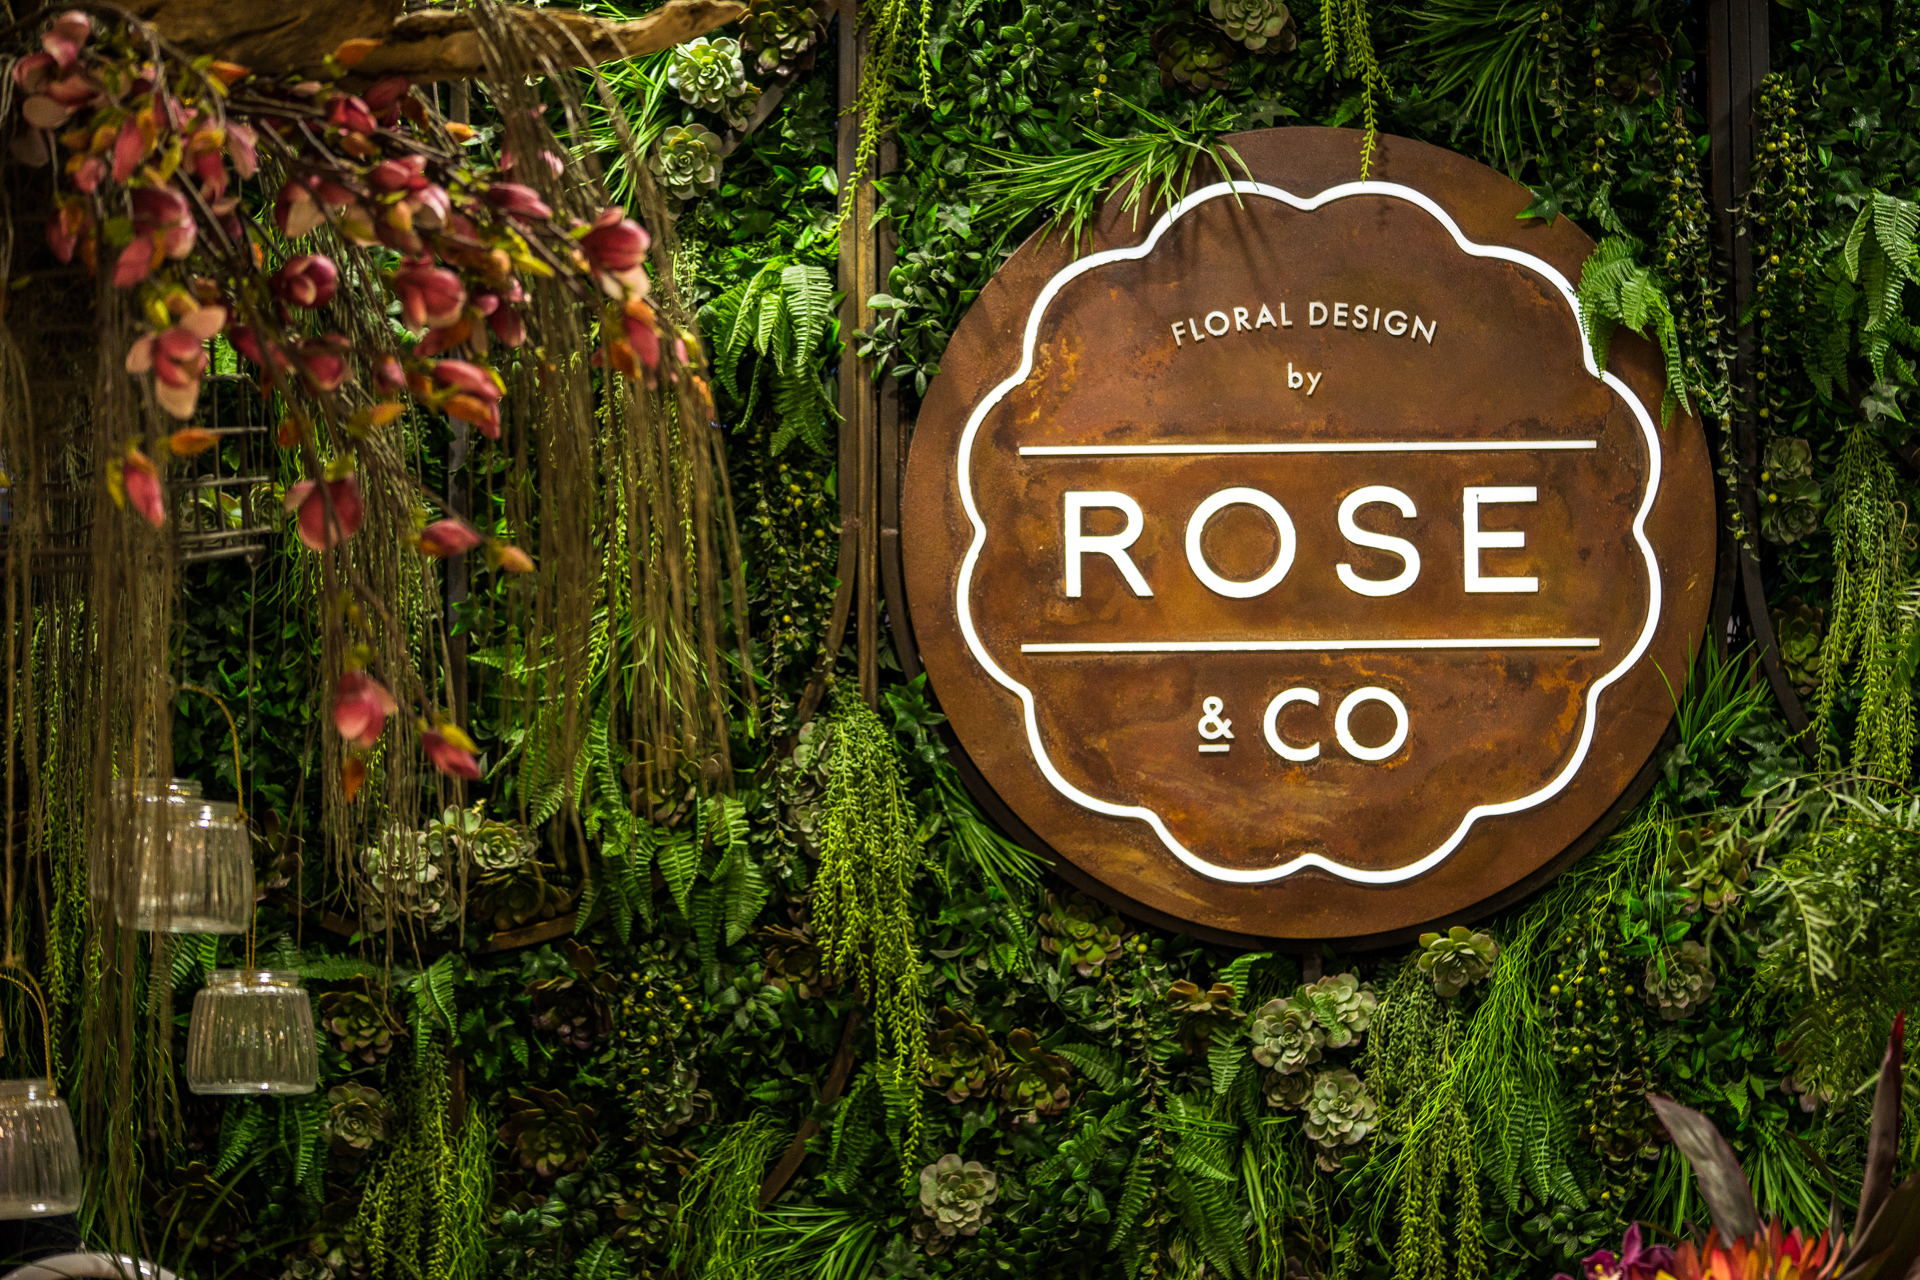 Rose & Co Florist Franchise Business